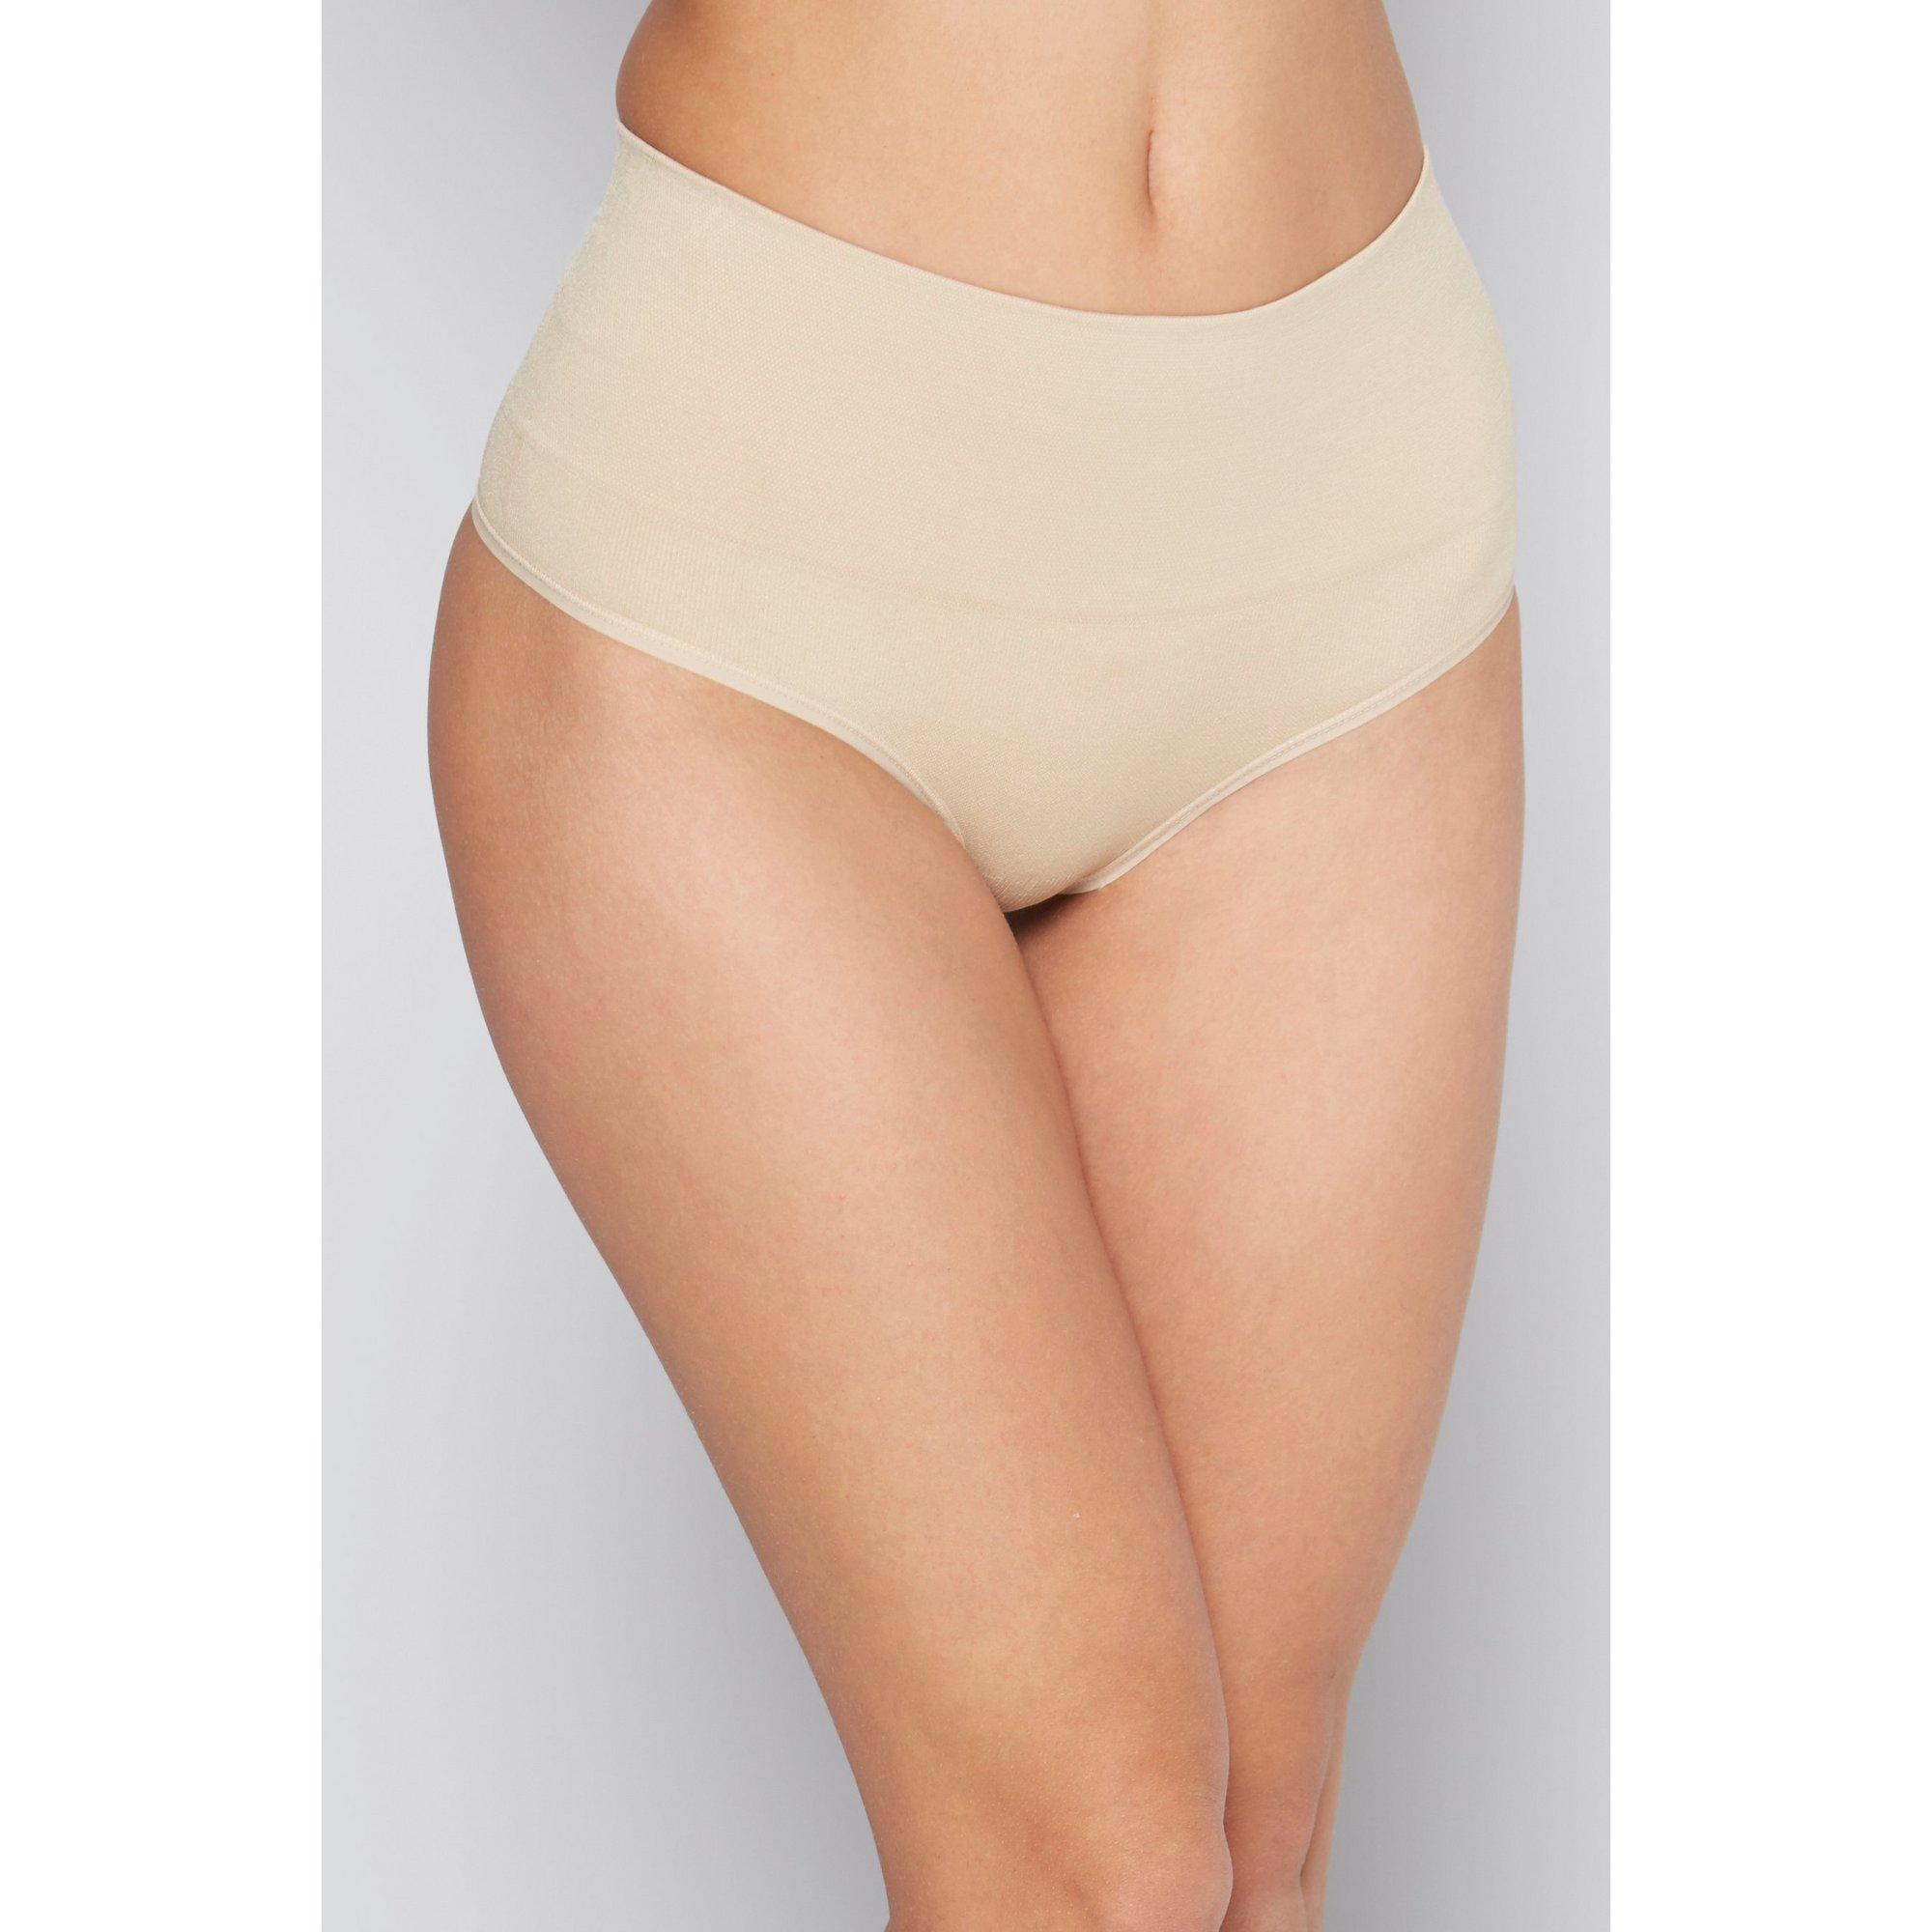 Image of High Waist Control Thongs